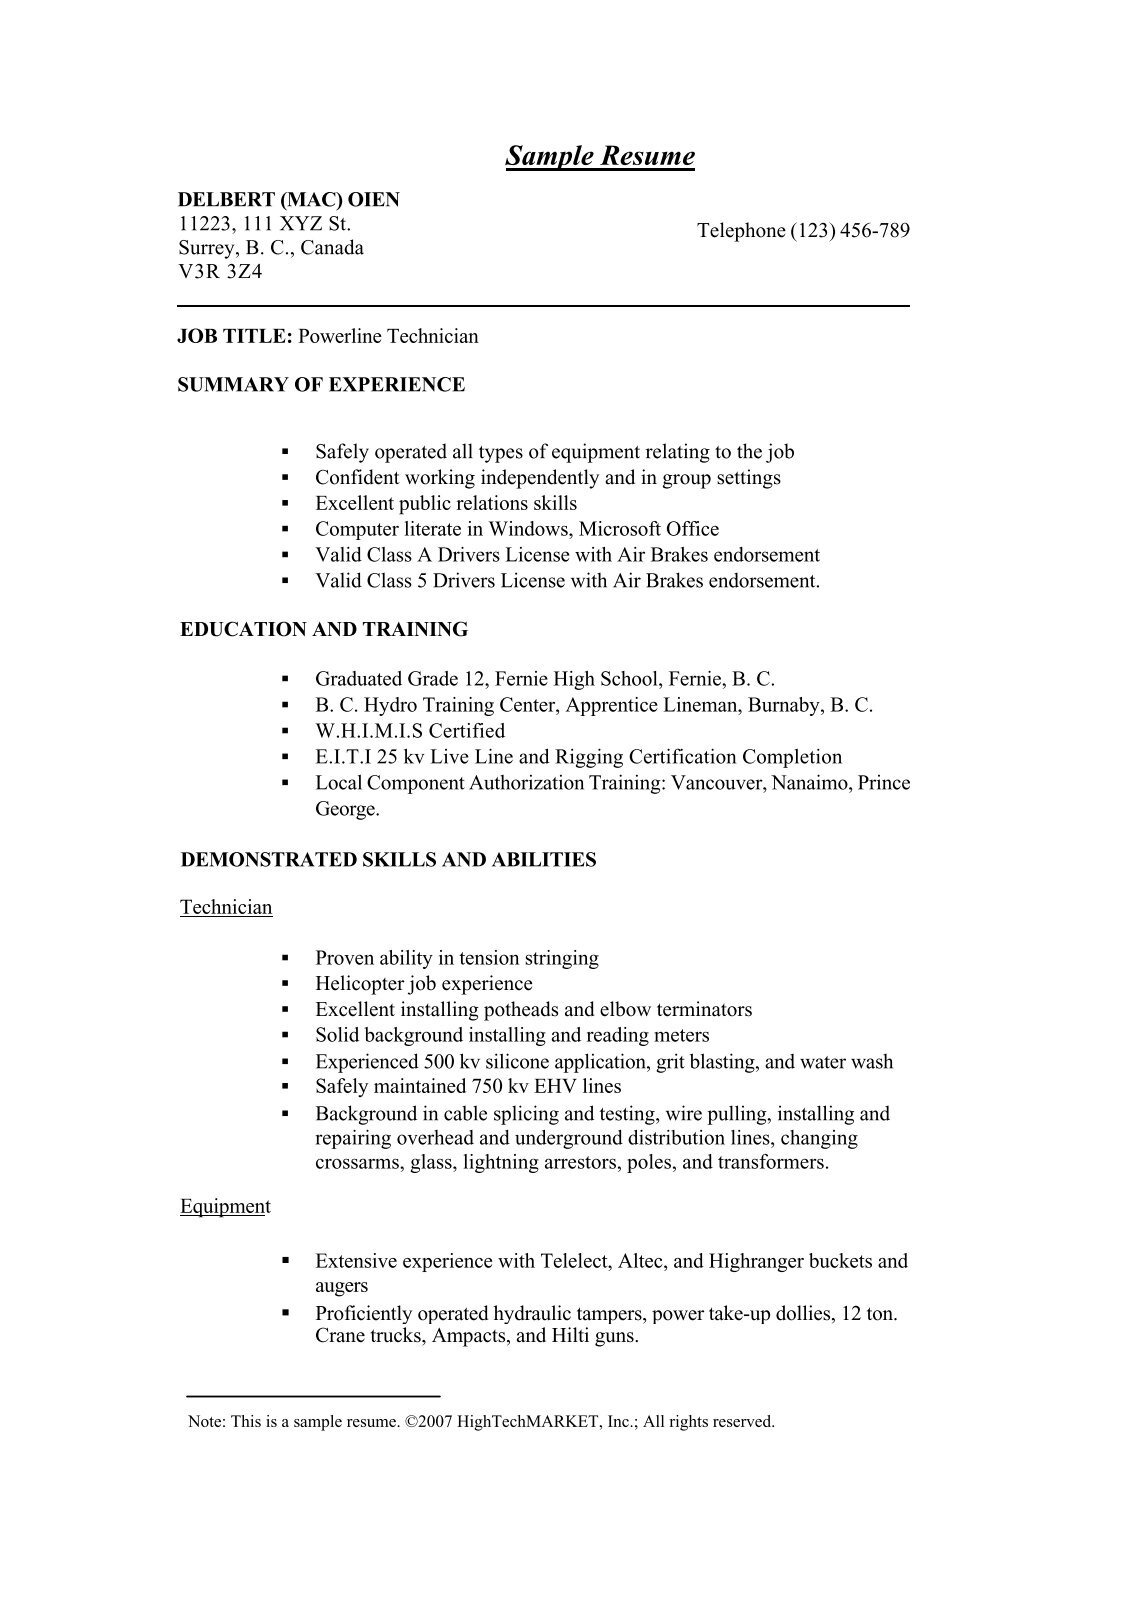 example cover letter engineering apprenticeship air sample resume application for powerline technician example cover letter - Hydro Test Engineer Sample Resume